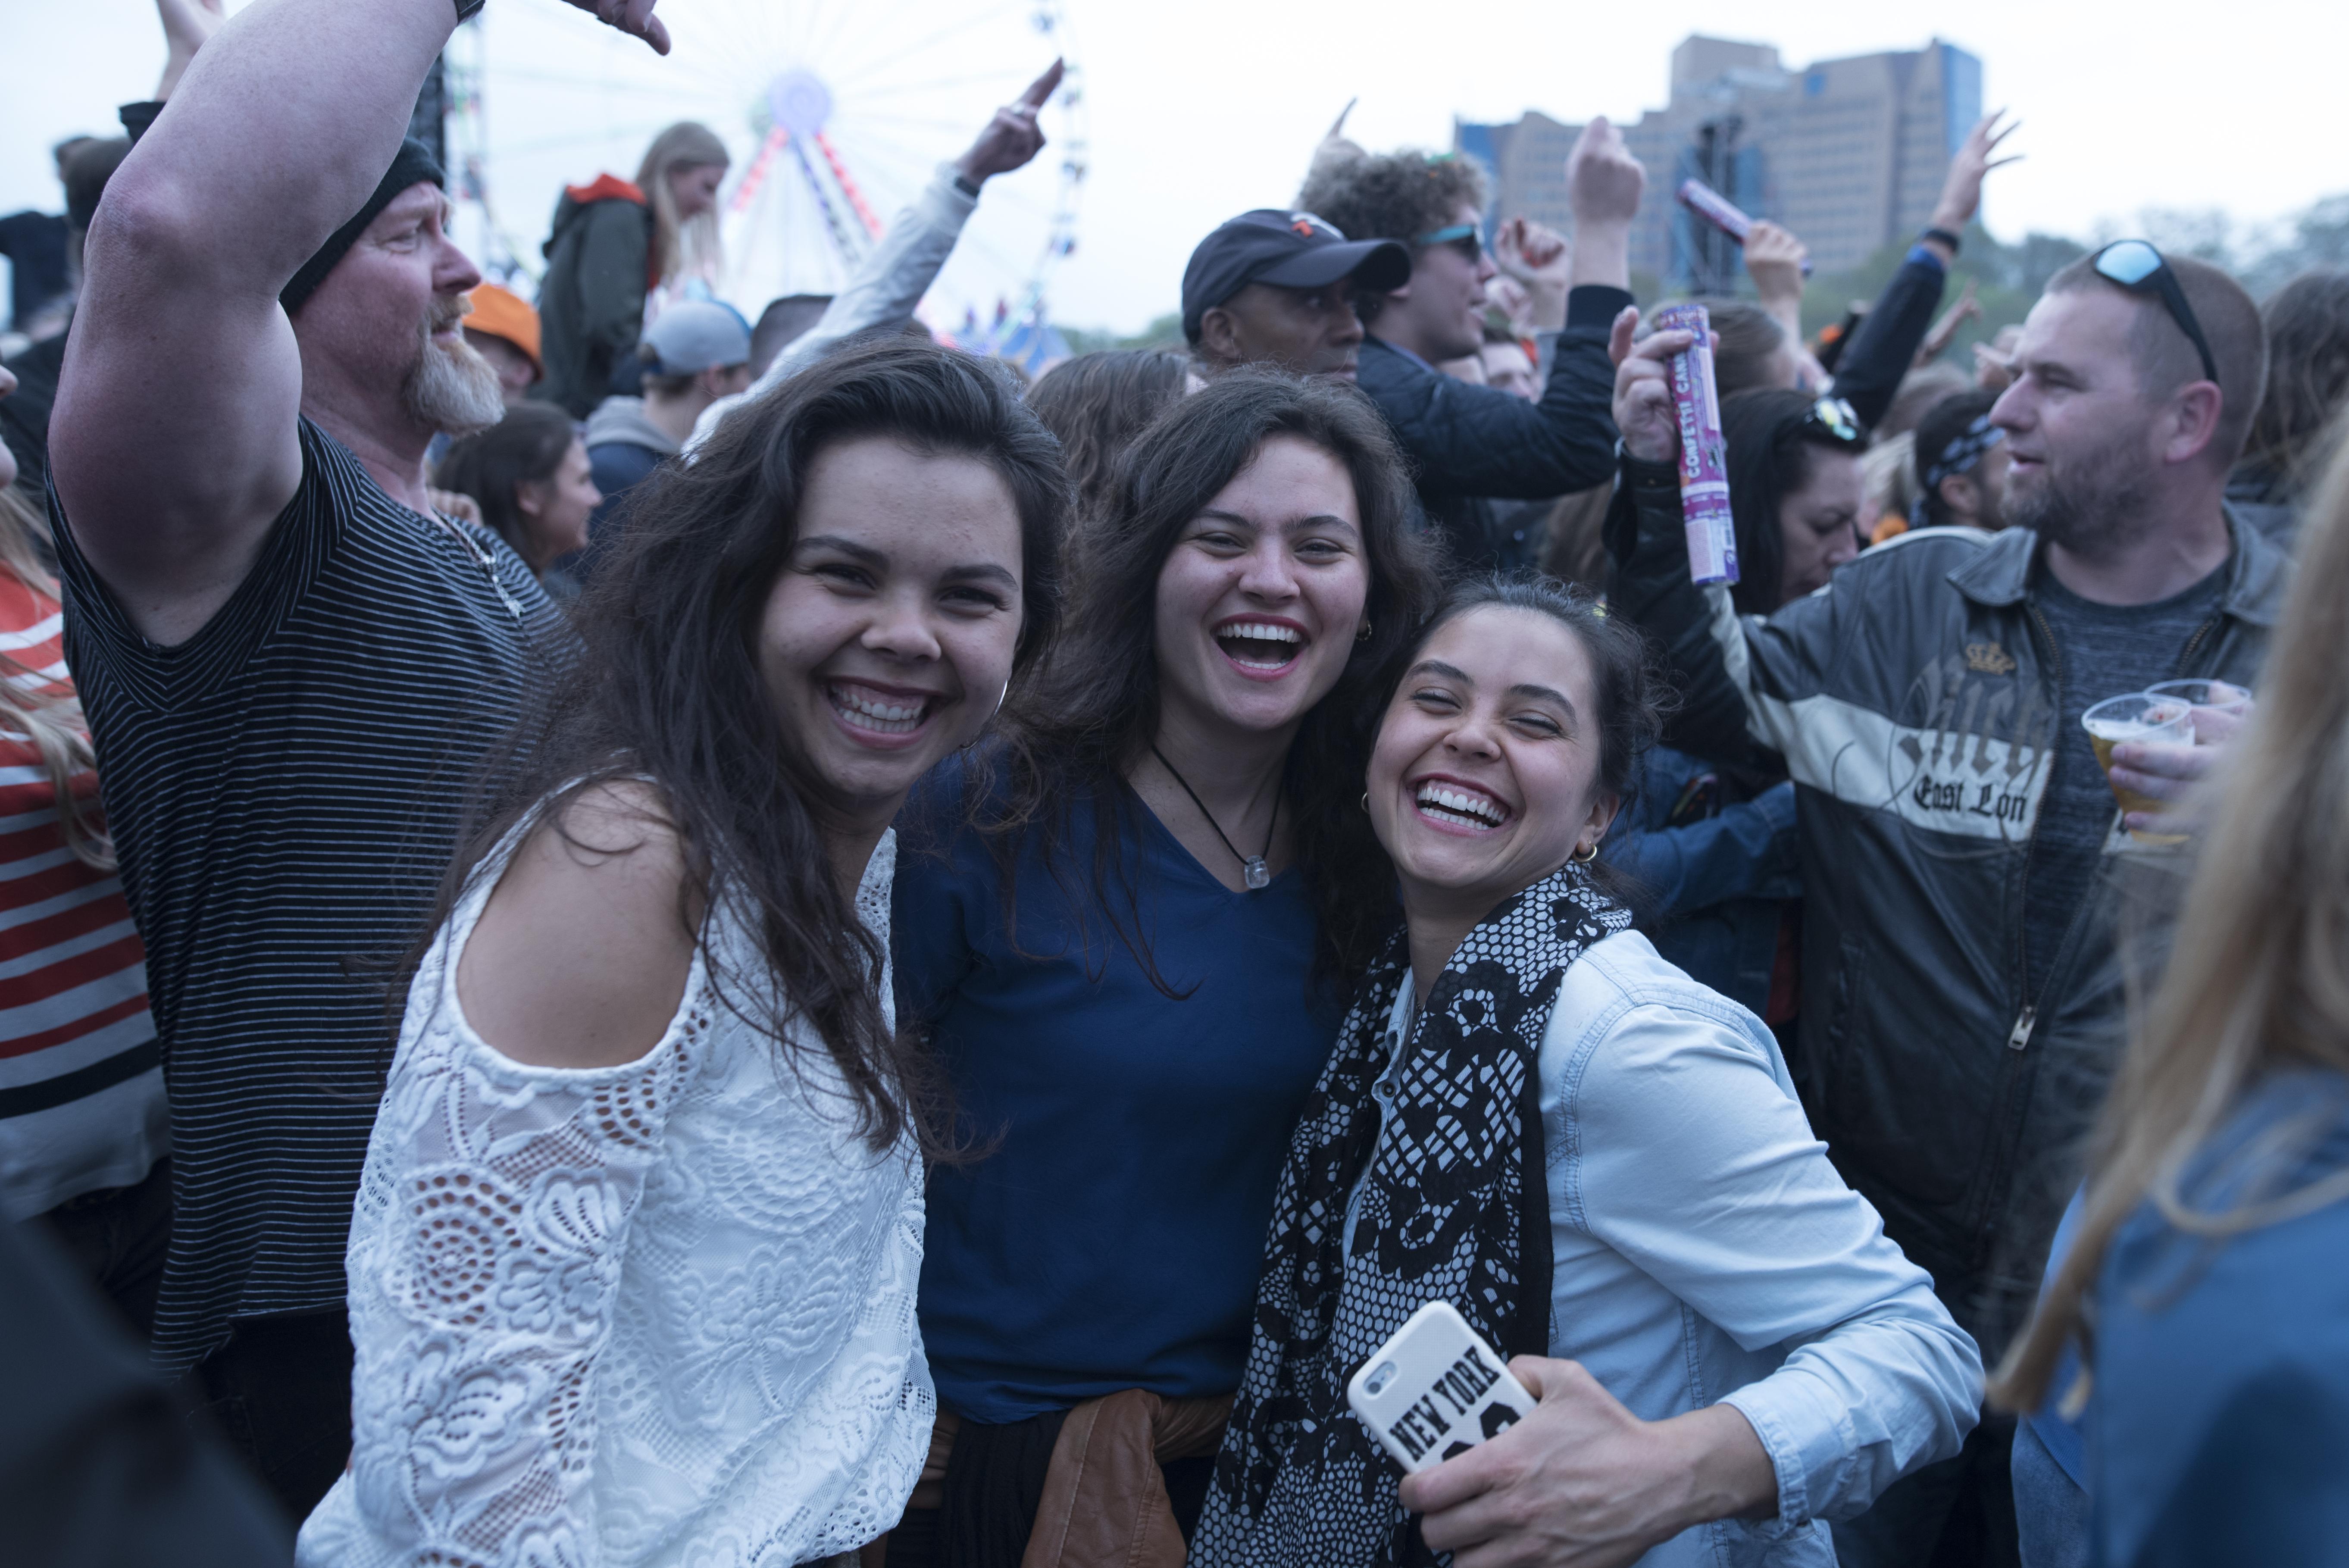 Festivalpubliek, Kingsland 2018 - Fotocredits Shali Blok (ArtiestenNieuws)